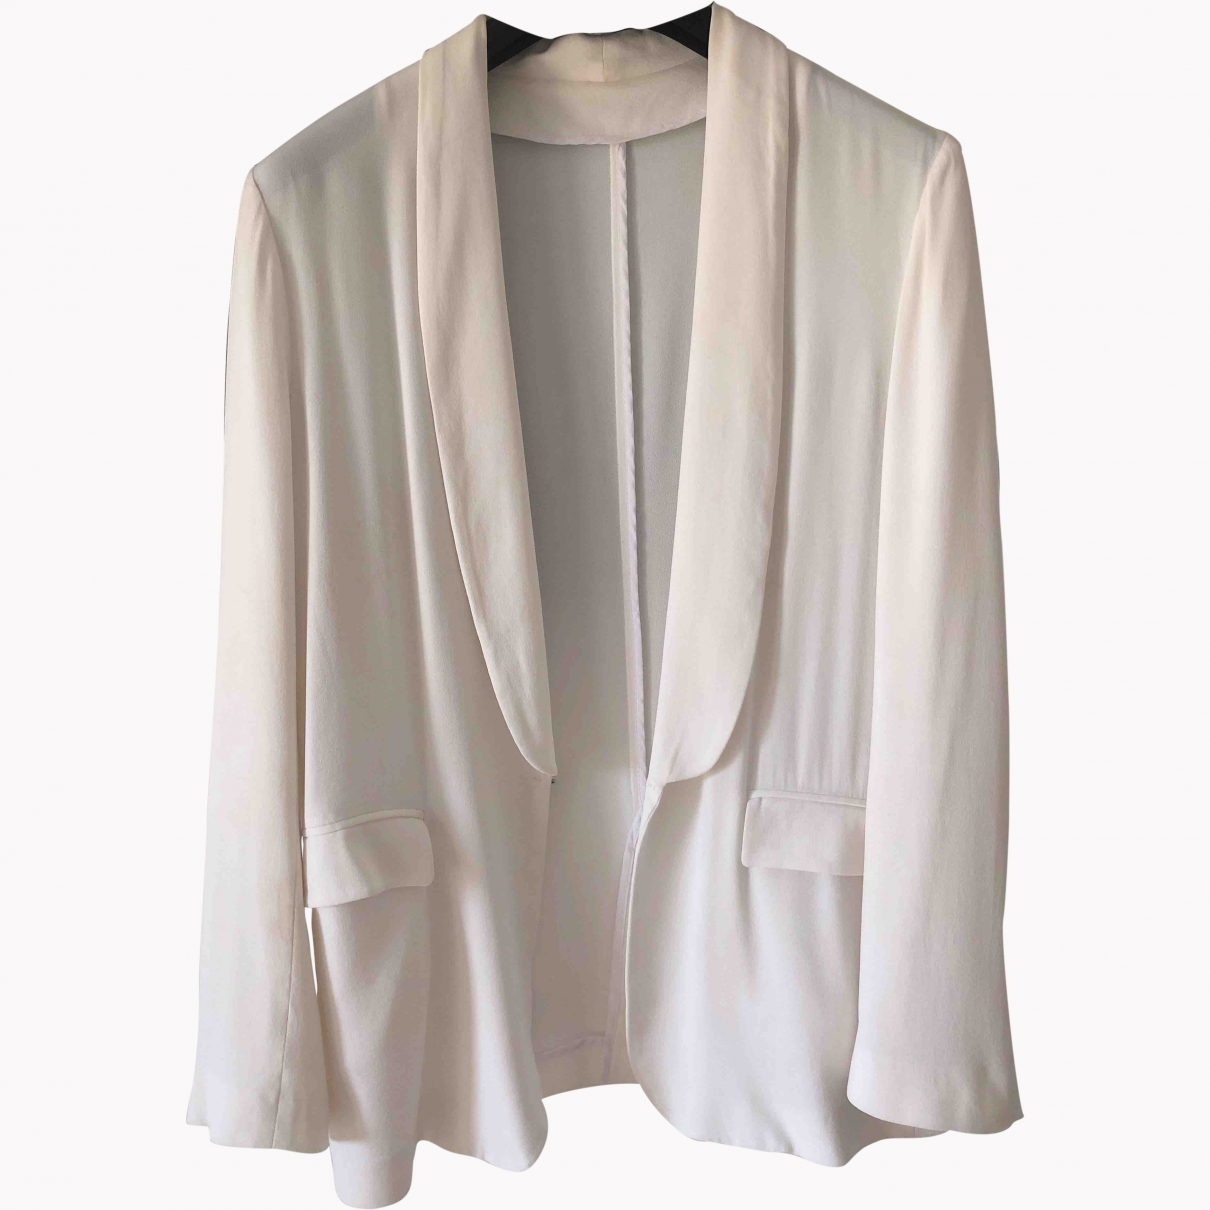 Msgm \N White jacket for Women 42 IT